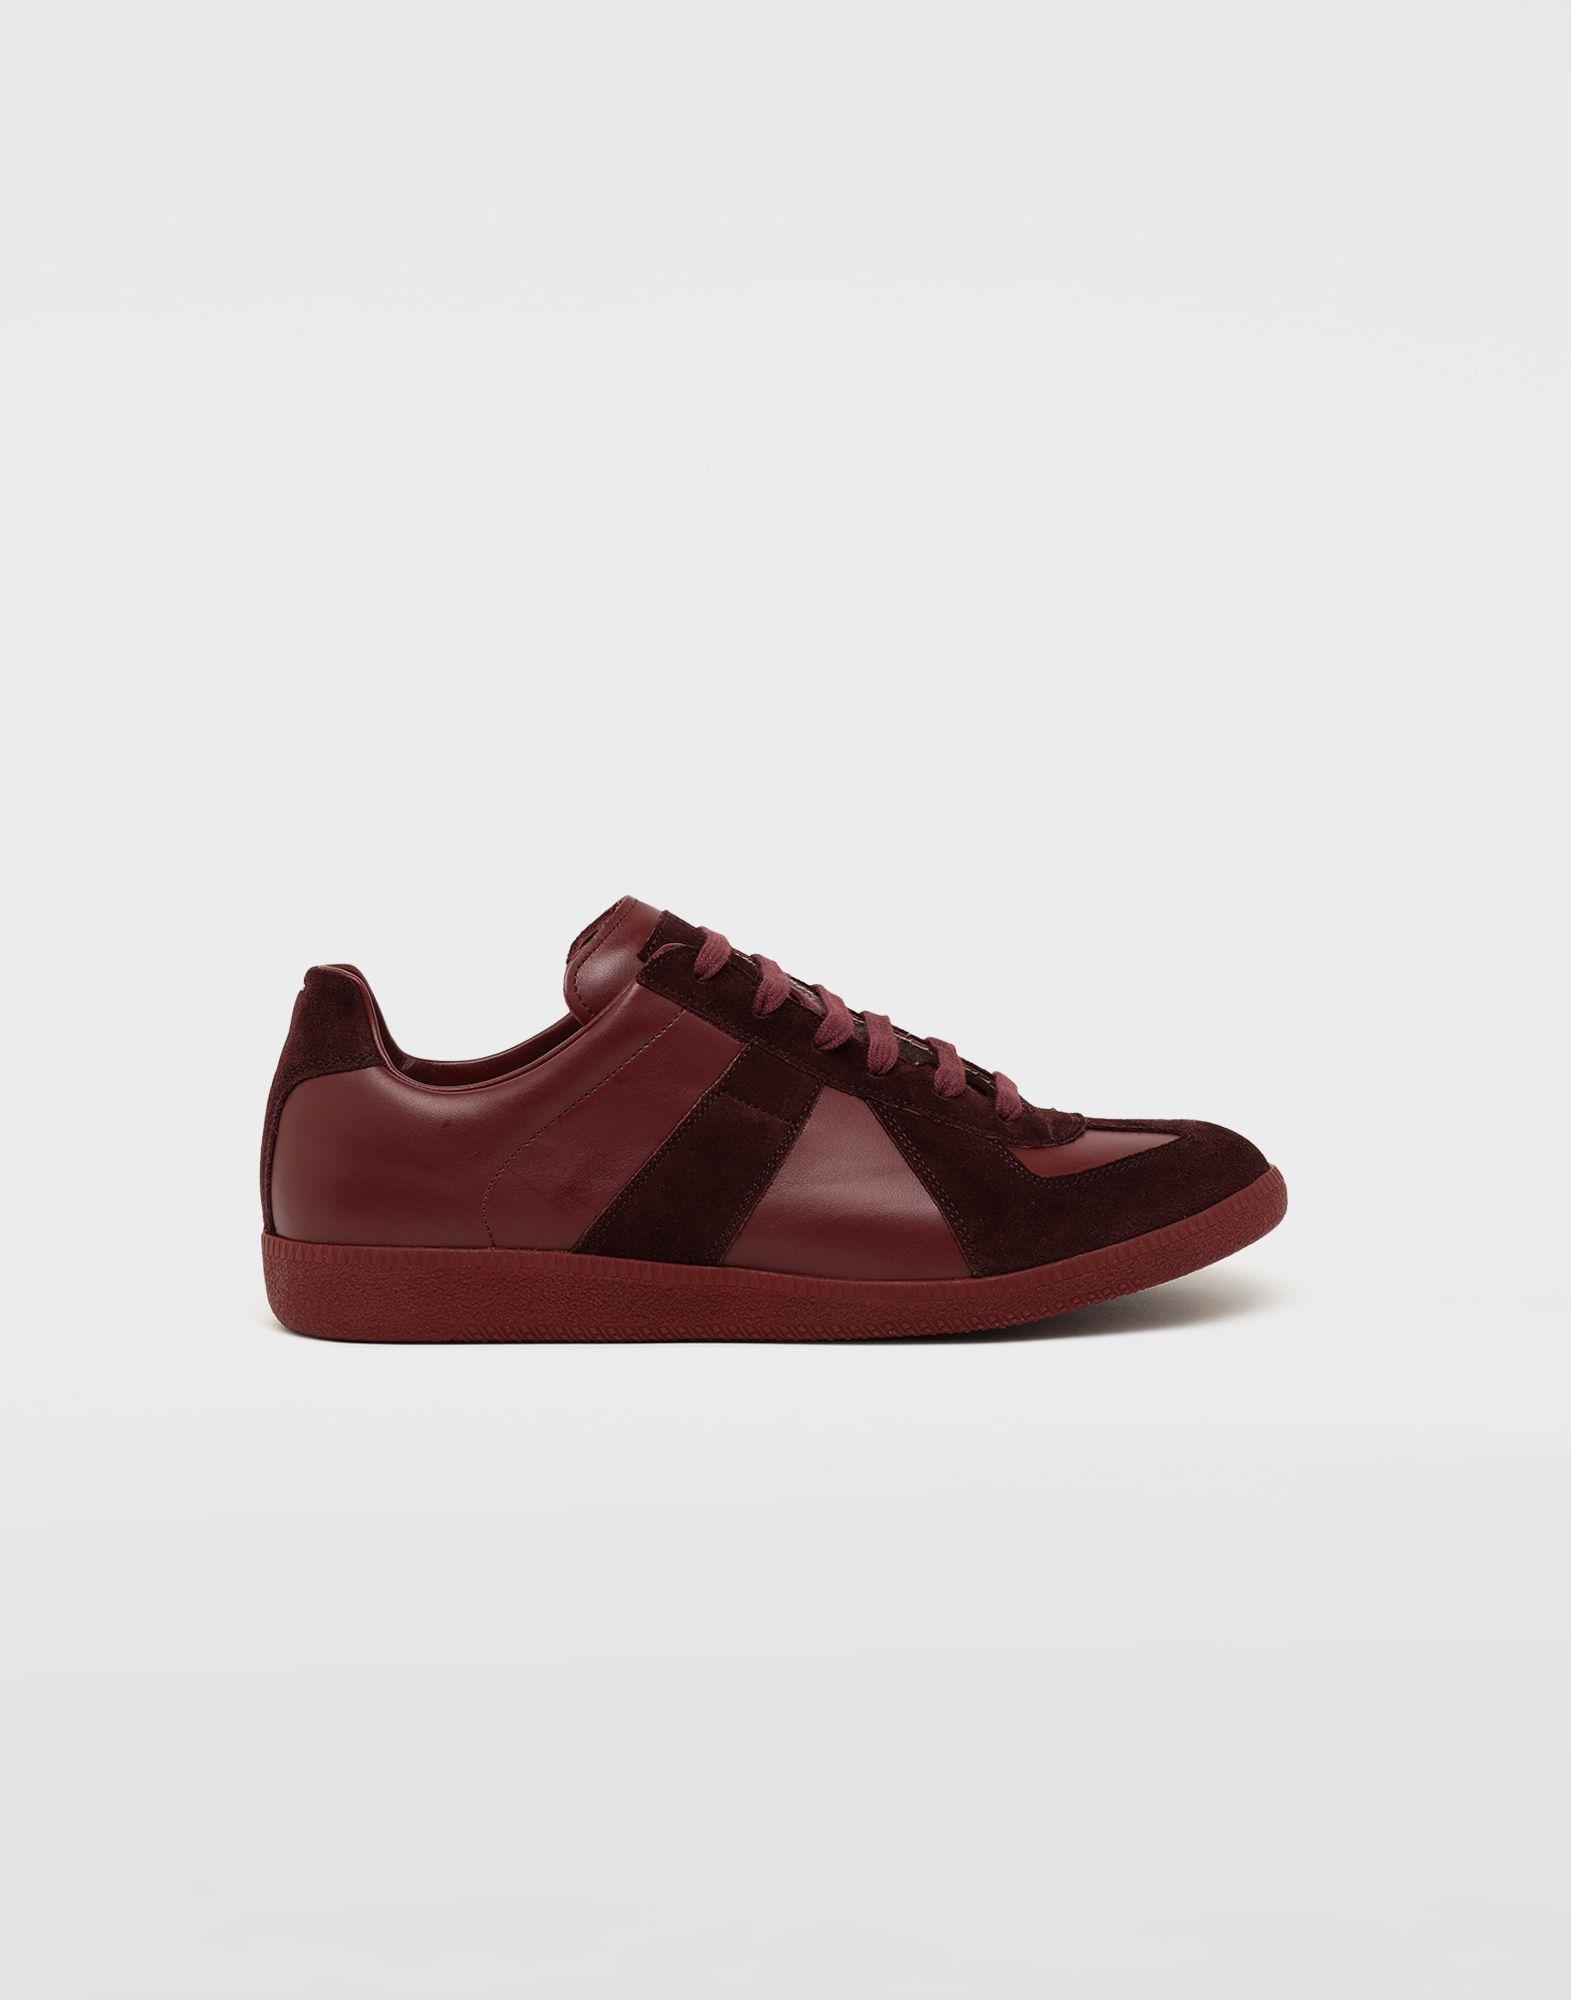 MAISON MARGIELA Replica low top sneakers Sneakers Man f